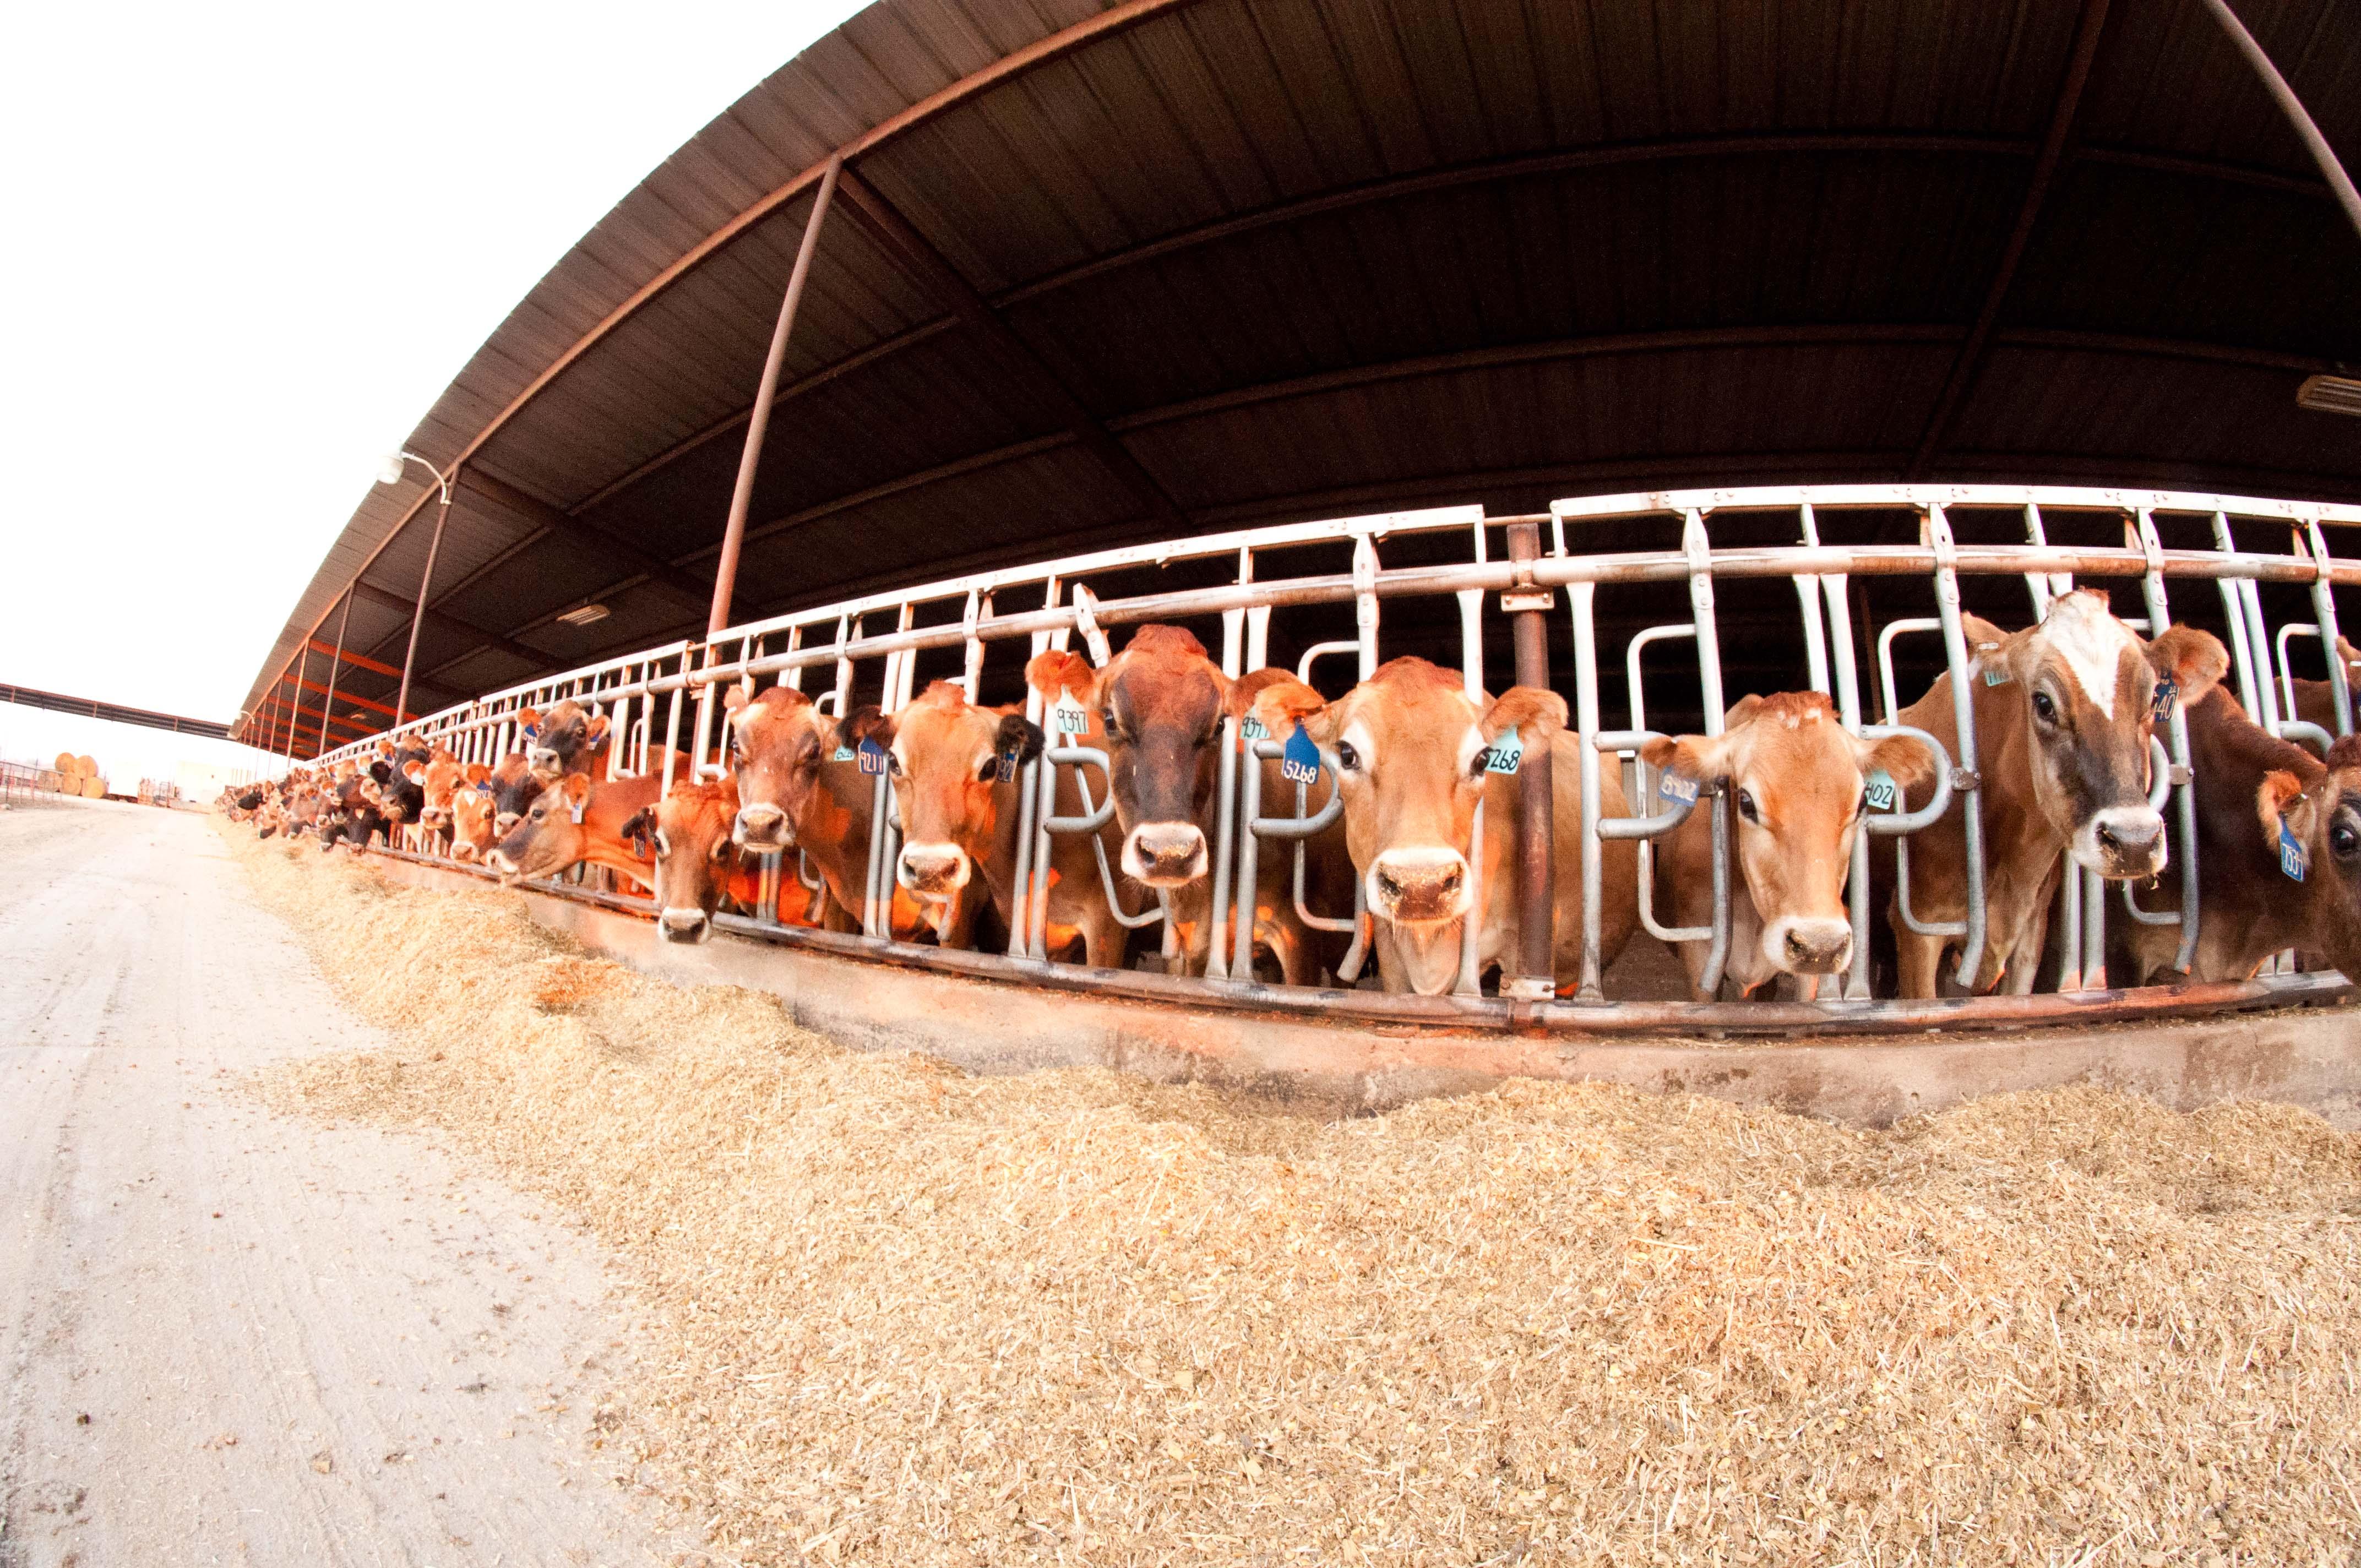 bovine ultrasound, cow ultrasound